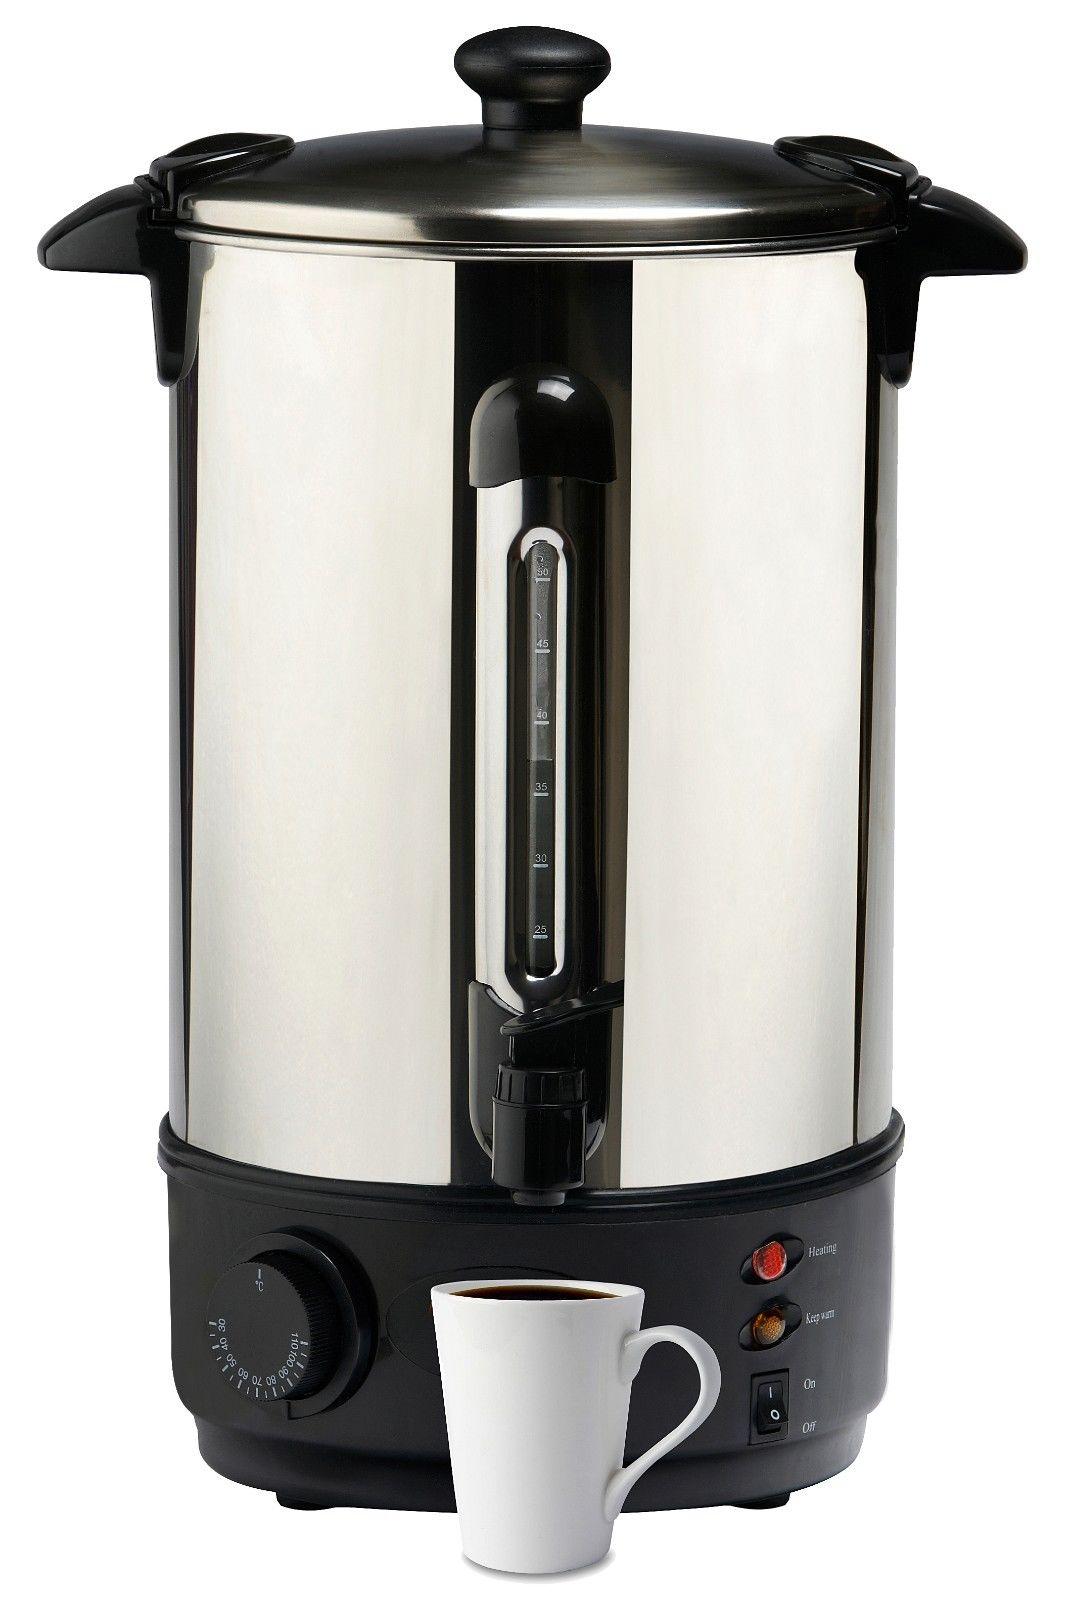 Lenoxx Ur10 10l Urn Boiler Hot Water Stainless Steel Ta